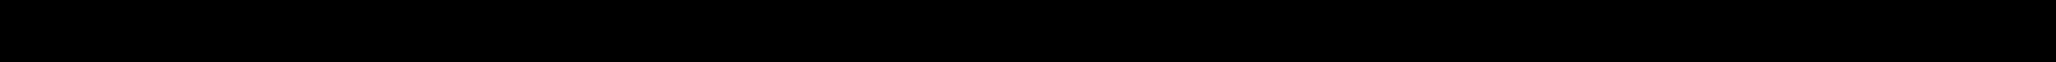 {\displaystyle A={\frac {1}{2}}(a_{1}[a_{2}\sin(\theta _{1})+a_{3}\sin(\theta _{1}+\theta _{2})+\cdots +a_{n-1}\sin(\theta _{1}+\theta _{2}+\cdots +\theta _{n-2})]+a_{2}[a_{3}\sin(\theta _{2})+a_{4}\sin(\theta _{2}+\theta _{3})+\cdots +a_{n-1}\sin(\theta _{2}+\cdots +\theta _{n-2})]+\cdots +a_{n-2}[a_{n-1}\sin(\theta _{n-2})])}